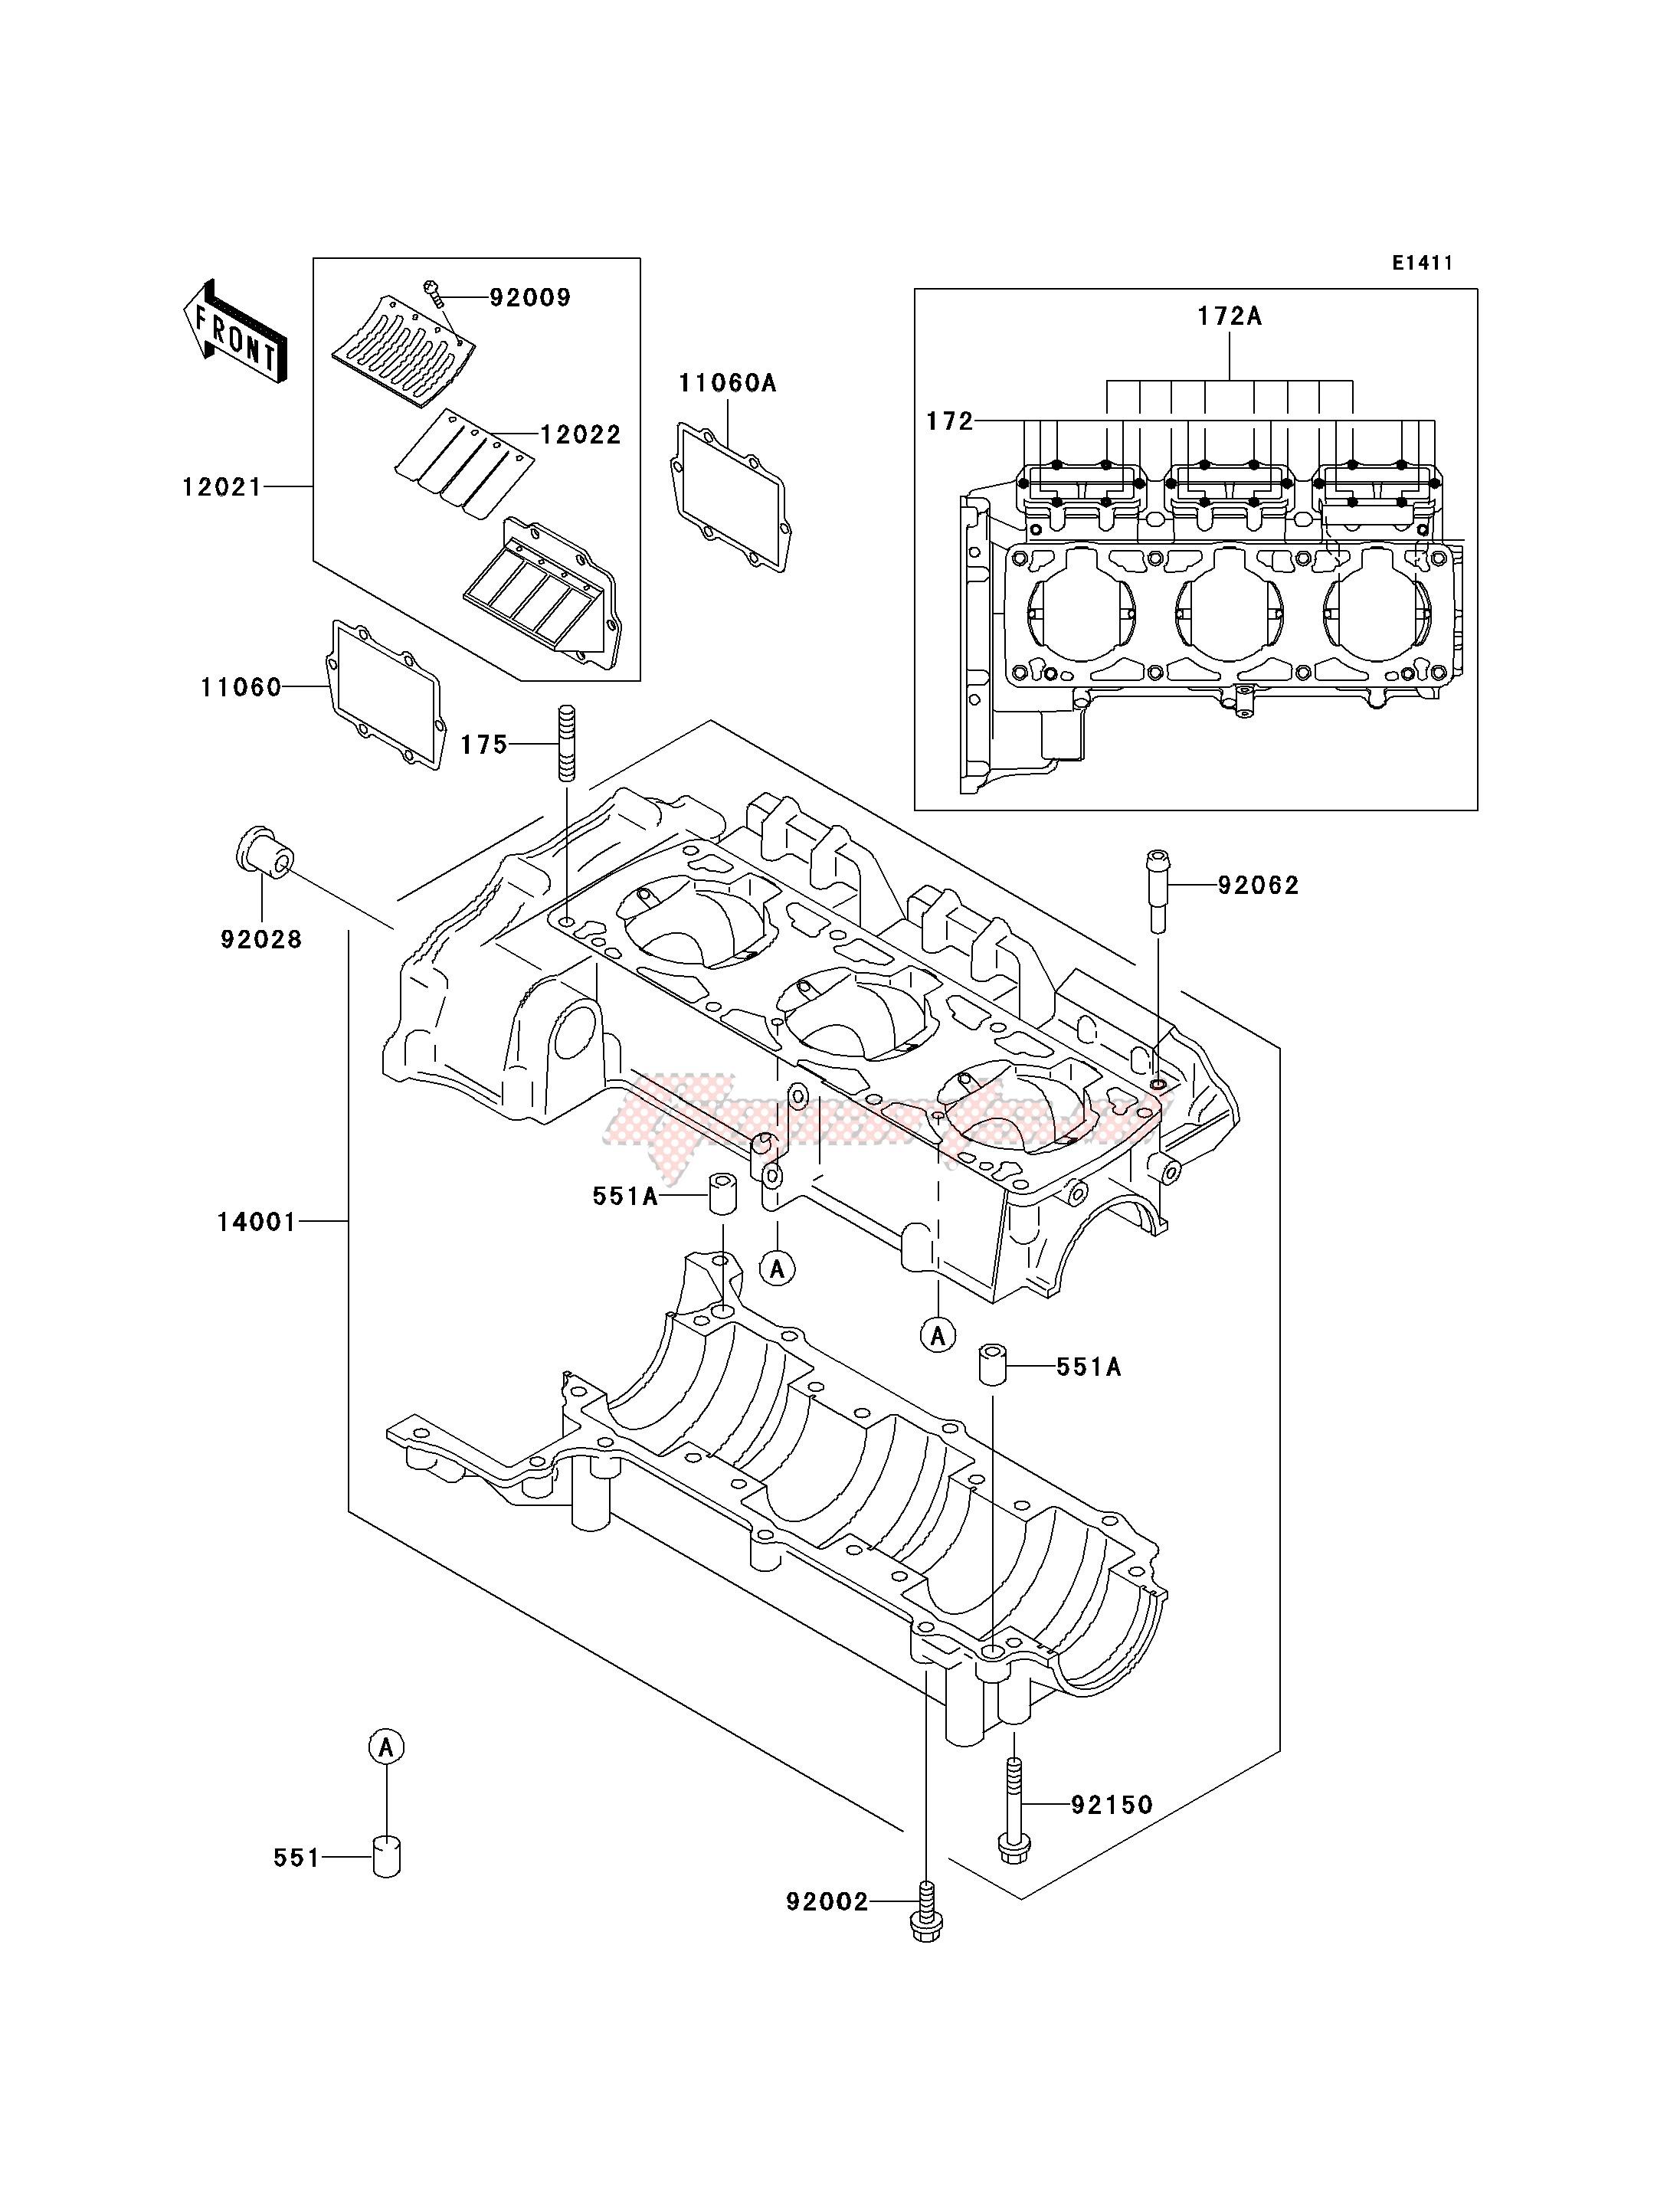 OEM parts Kawasaki [Jet ski] JT 900 C [900 STX] (C1-C2